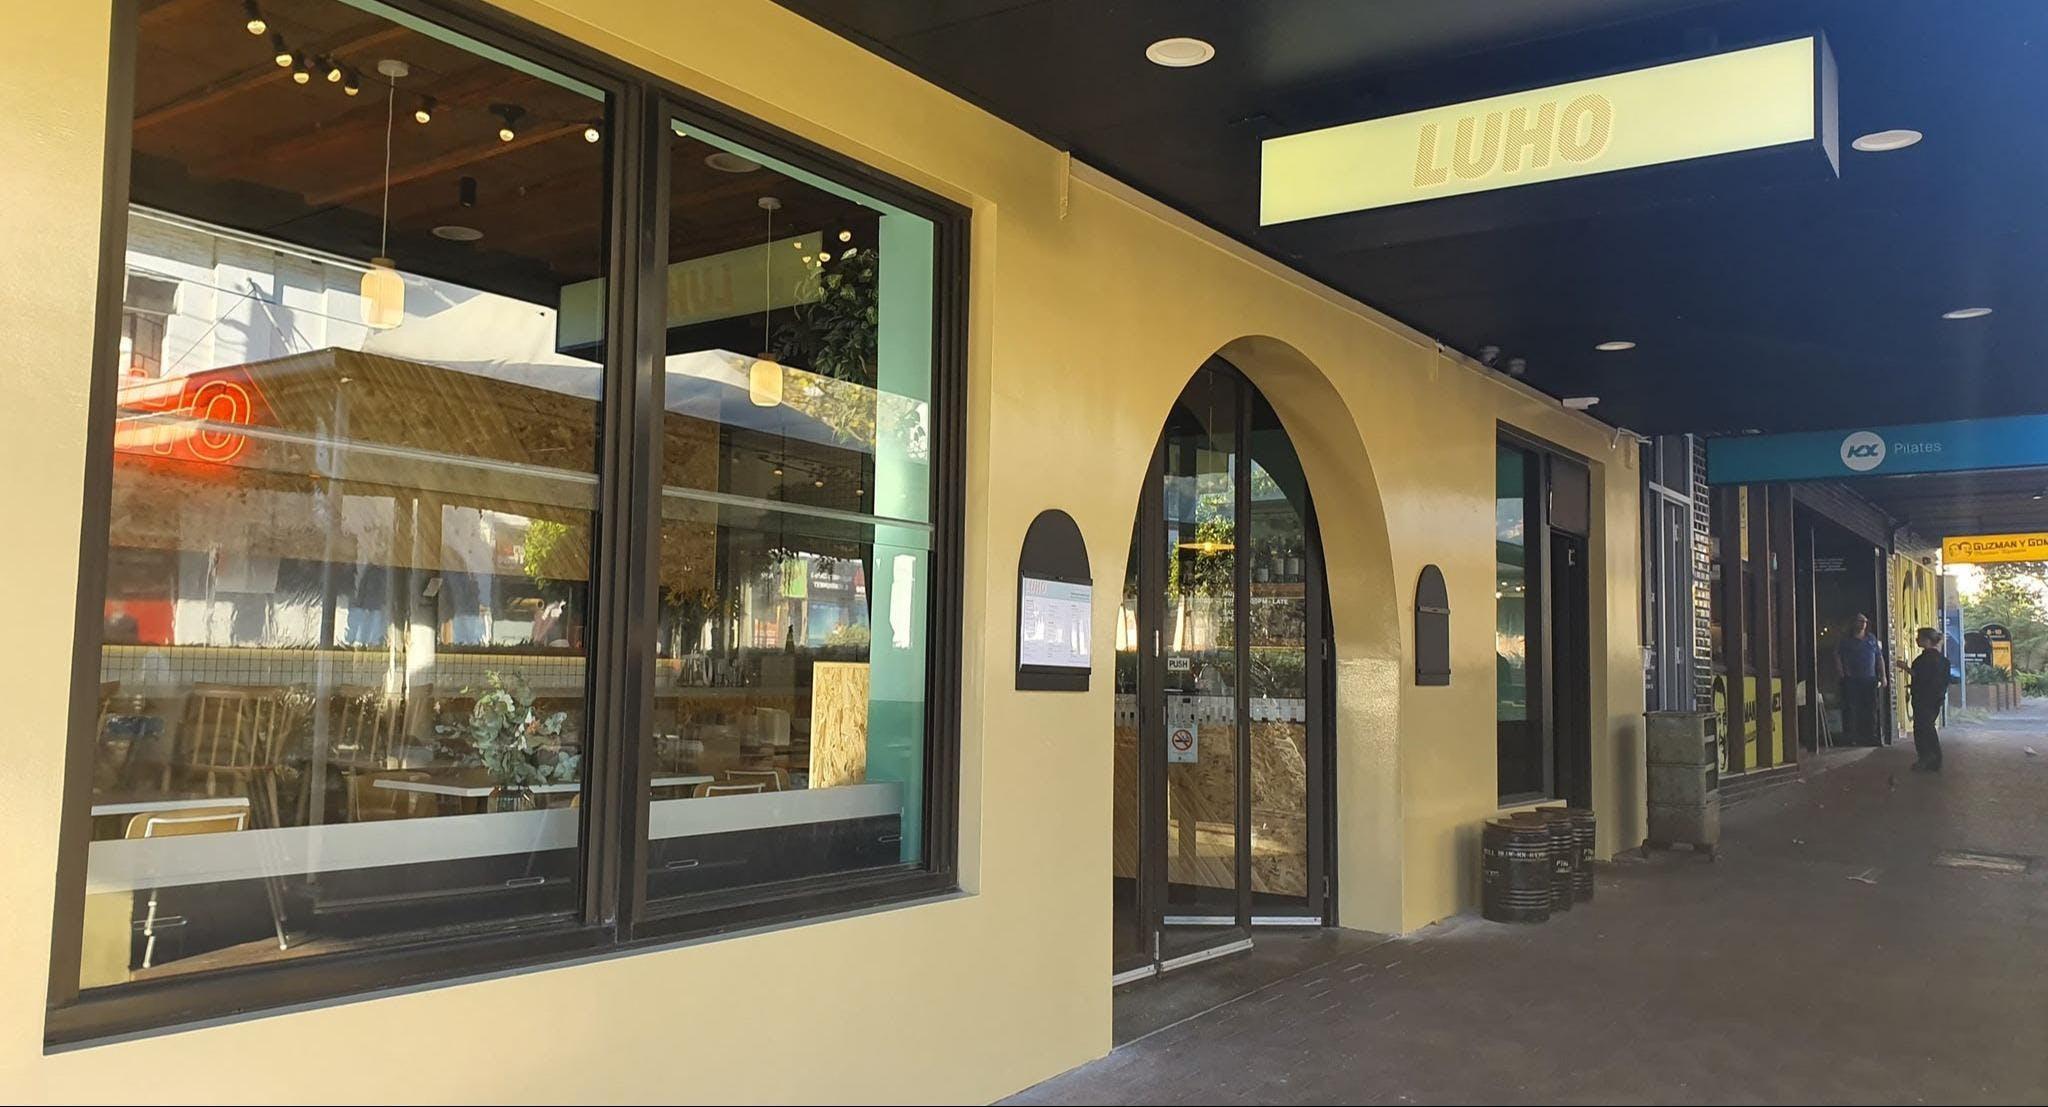 Luho Restaurant Sydney image 3